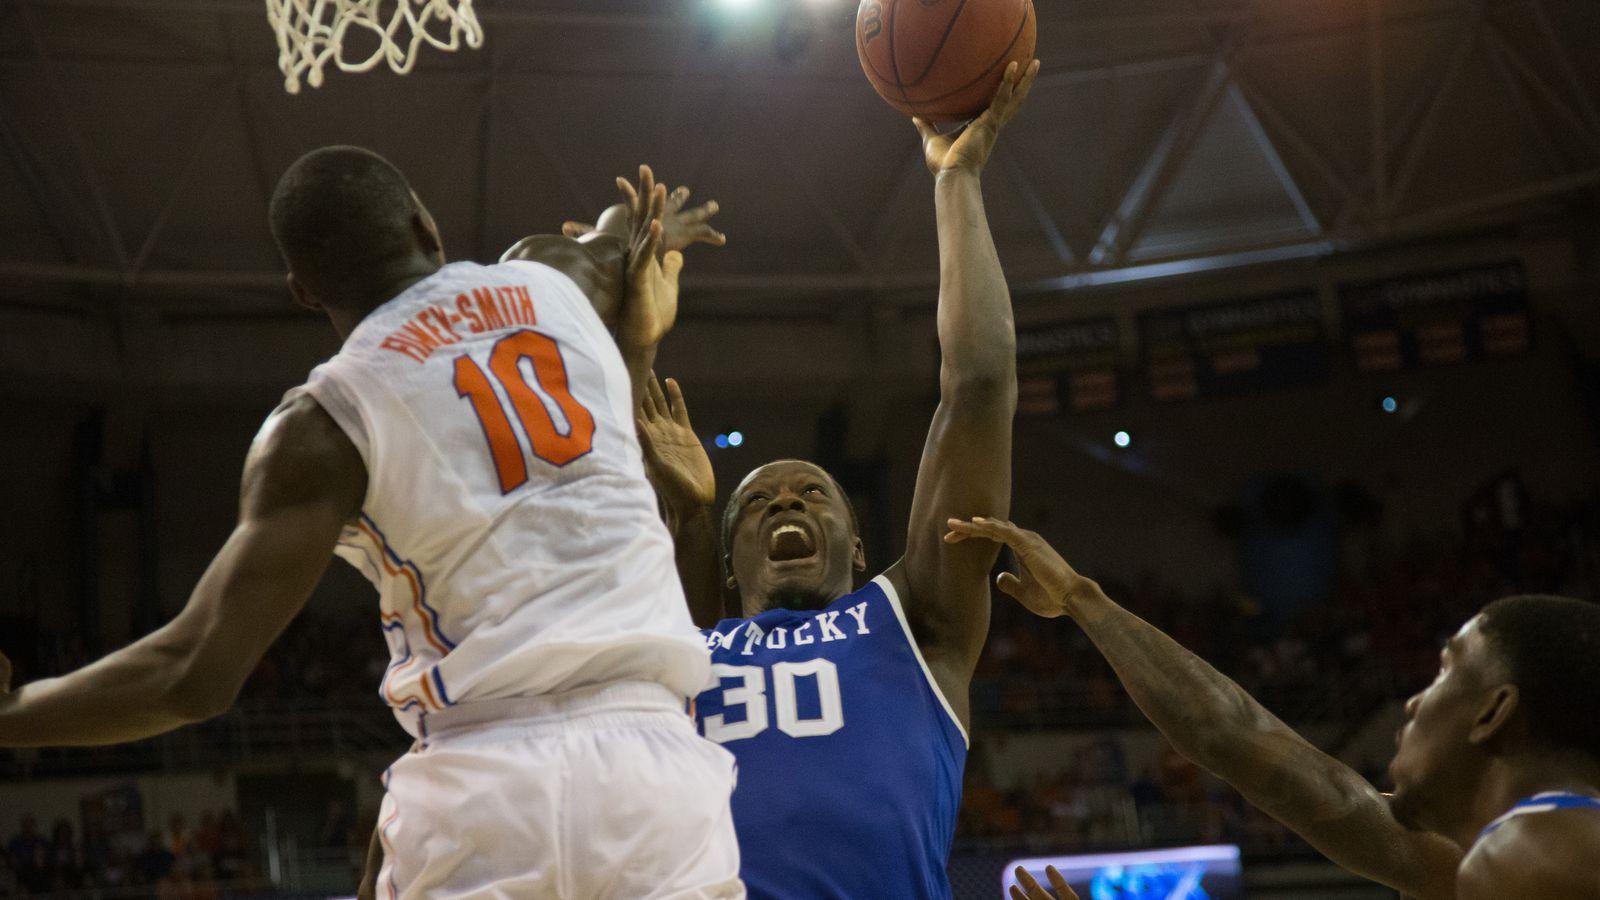 Kentucky Basketball Named Preseason Favorite For Sec Crown: Kentucky Wildcat Basketball: The SEC Tournament Schedule